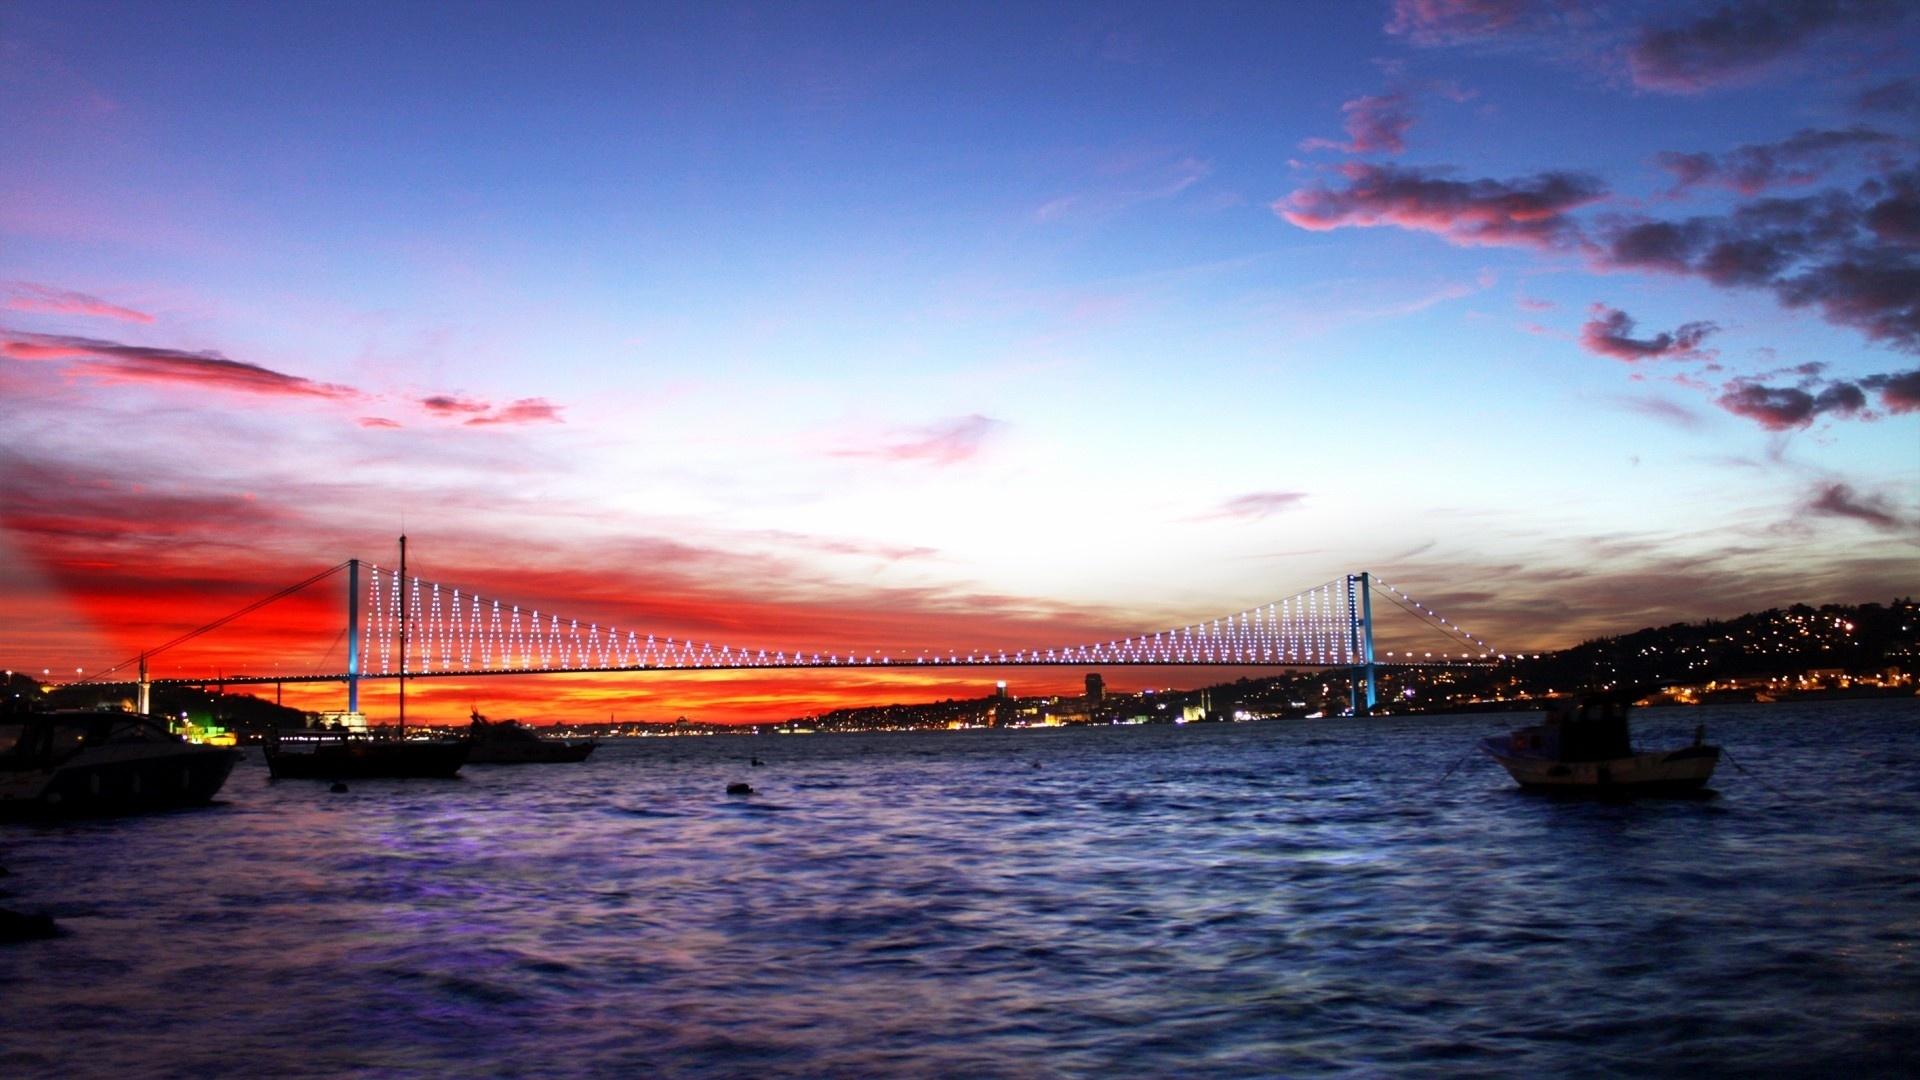 Bosphorus Bridge Istanbul Wallpapers - 1920x1080 - 518384